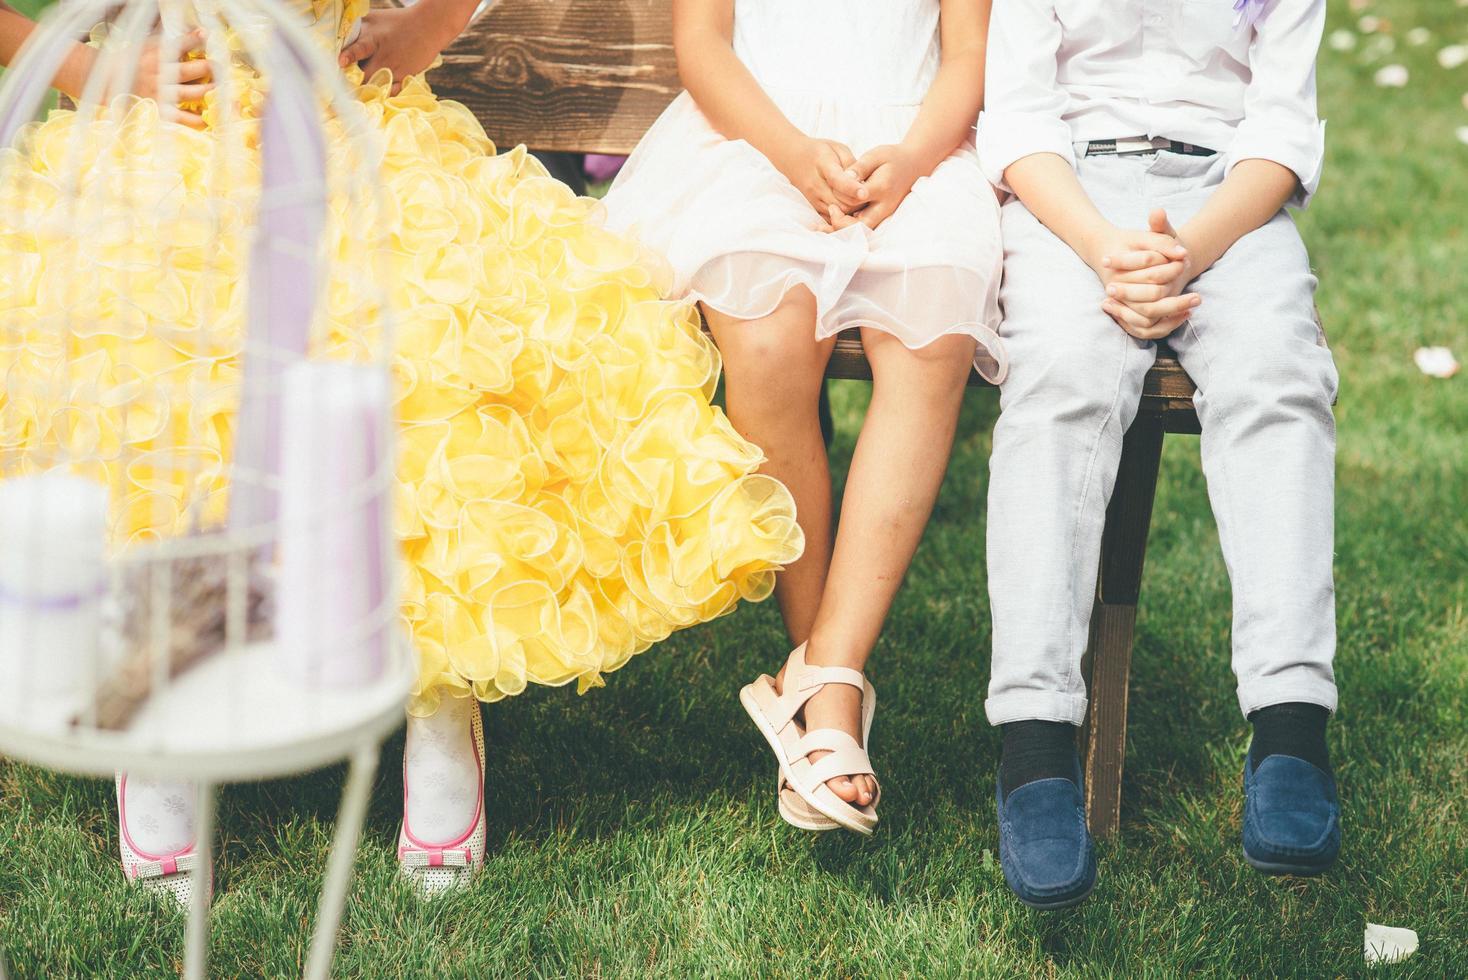 petits invités à un mariage photo